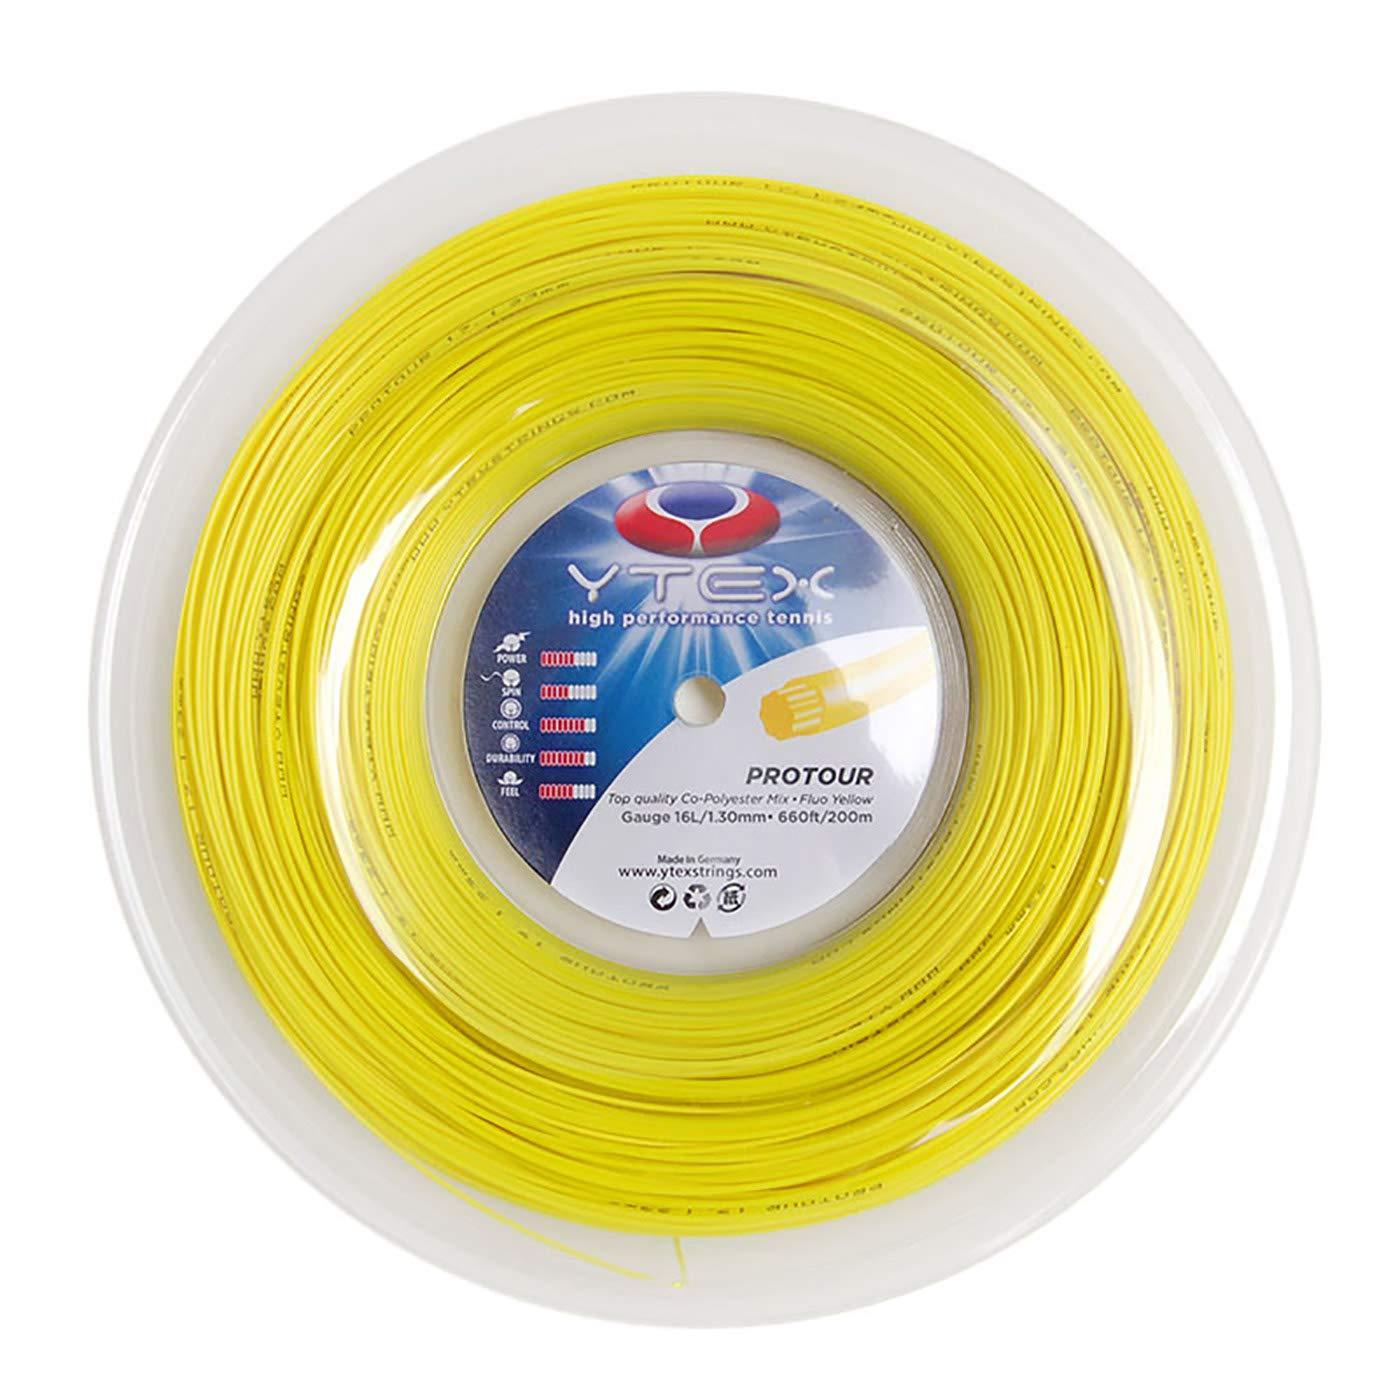 YTEX Protour Fluo (16L Yellow Tennis 1.30mm) Yellow Racquet String Reel (16L Gauge, 1.30mm) 141[並行輸入] B07PM8878X, アクネシ:d195e81d --- amlakzamanpour.ir